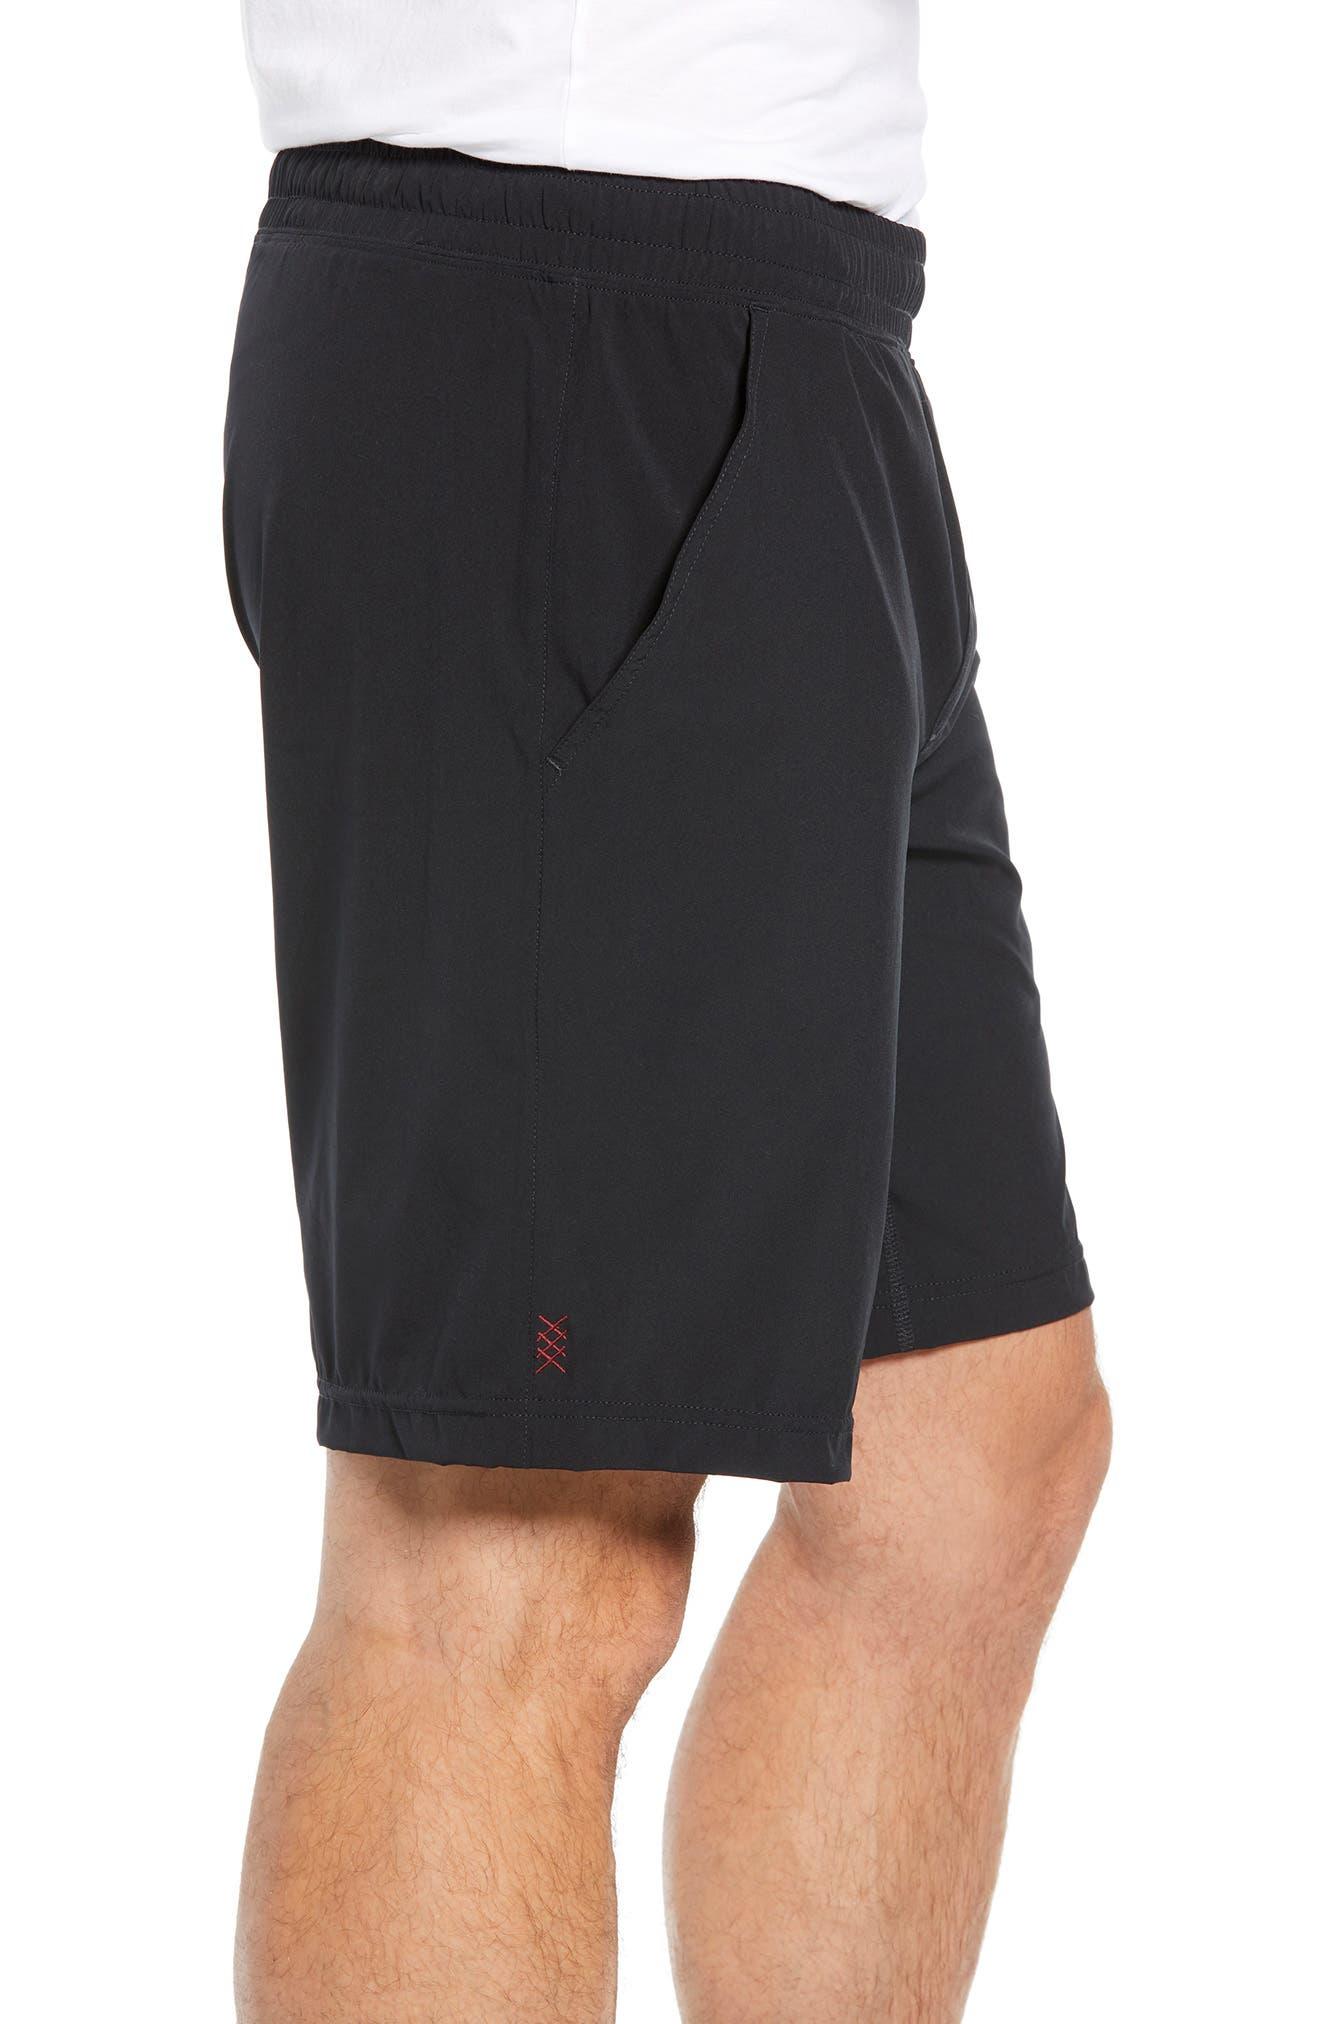 RHONE, Mako Lined Shorts, Alternate thumbnail 3, color, BLACK